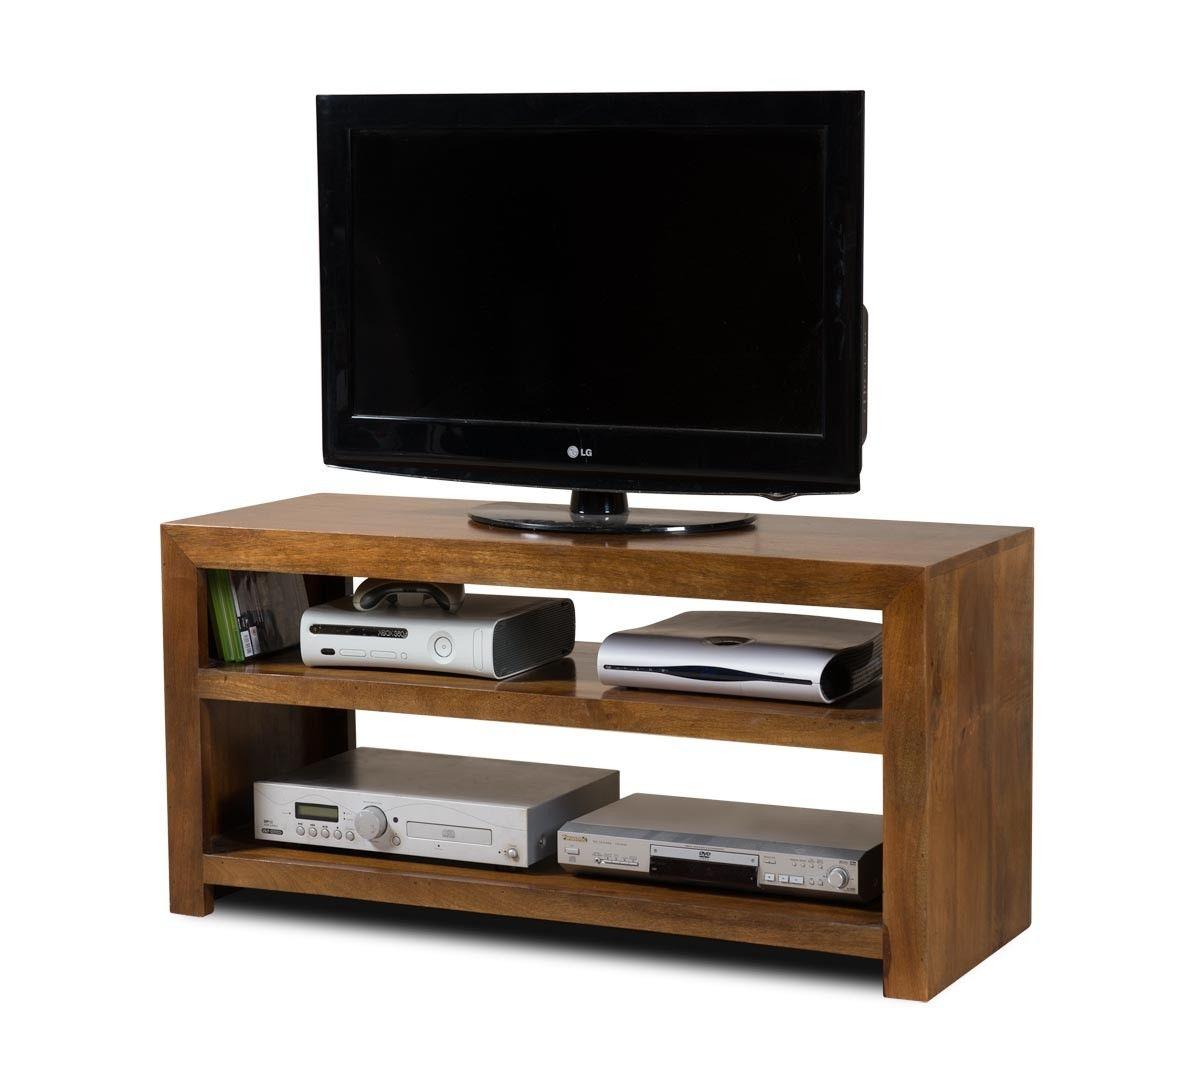 Dakota Mango Wide Hi Fi Shelving Unit 1 Furniture Pinterest  # Hifi Furniture Wood High Quality